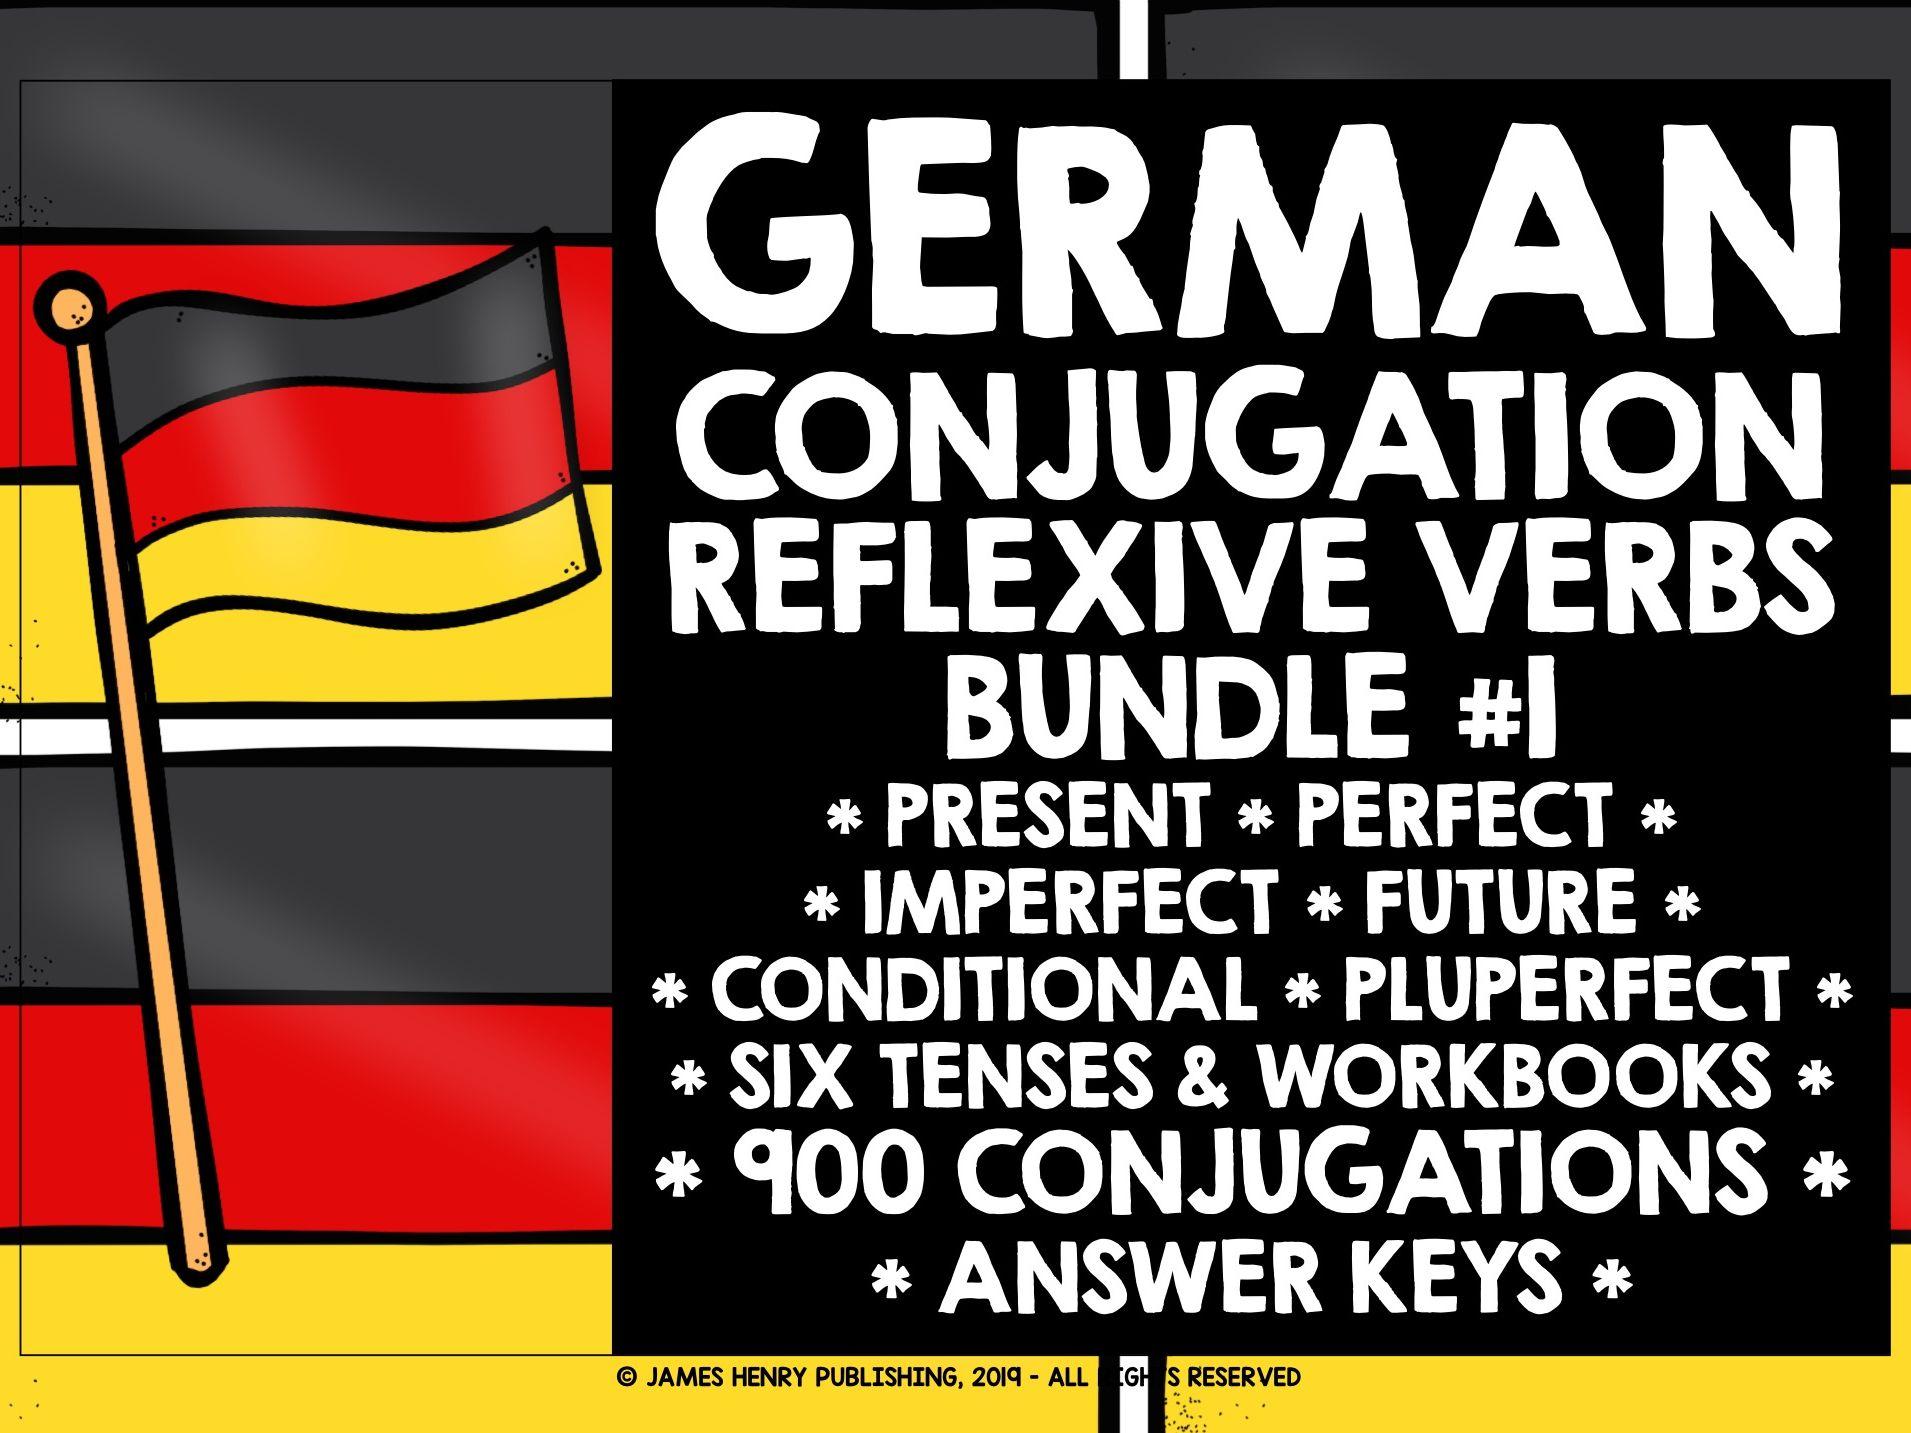 GERMAN REFLEXIVE VERBS CONJUGATION DRILLS BUNDLE #1